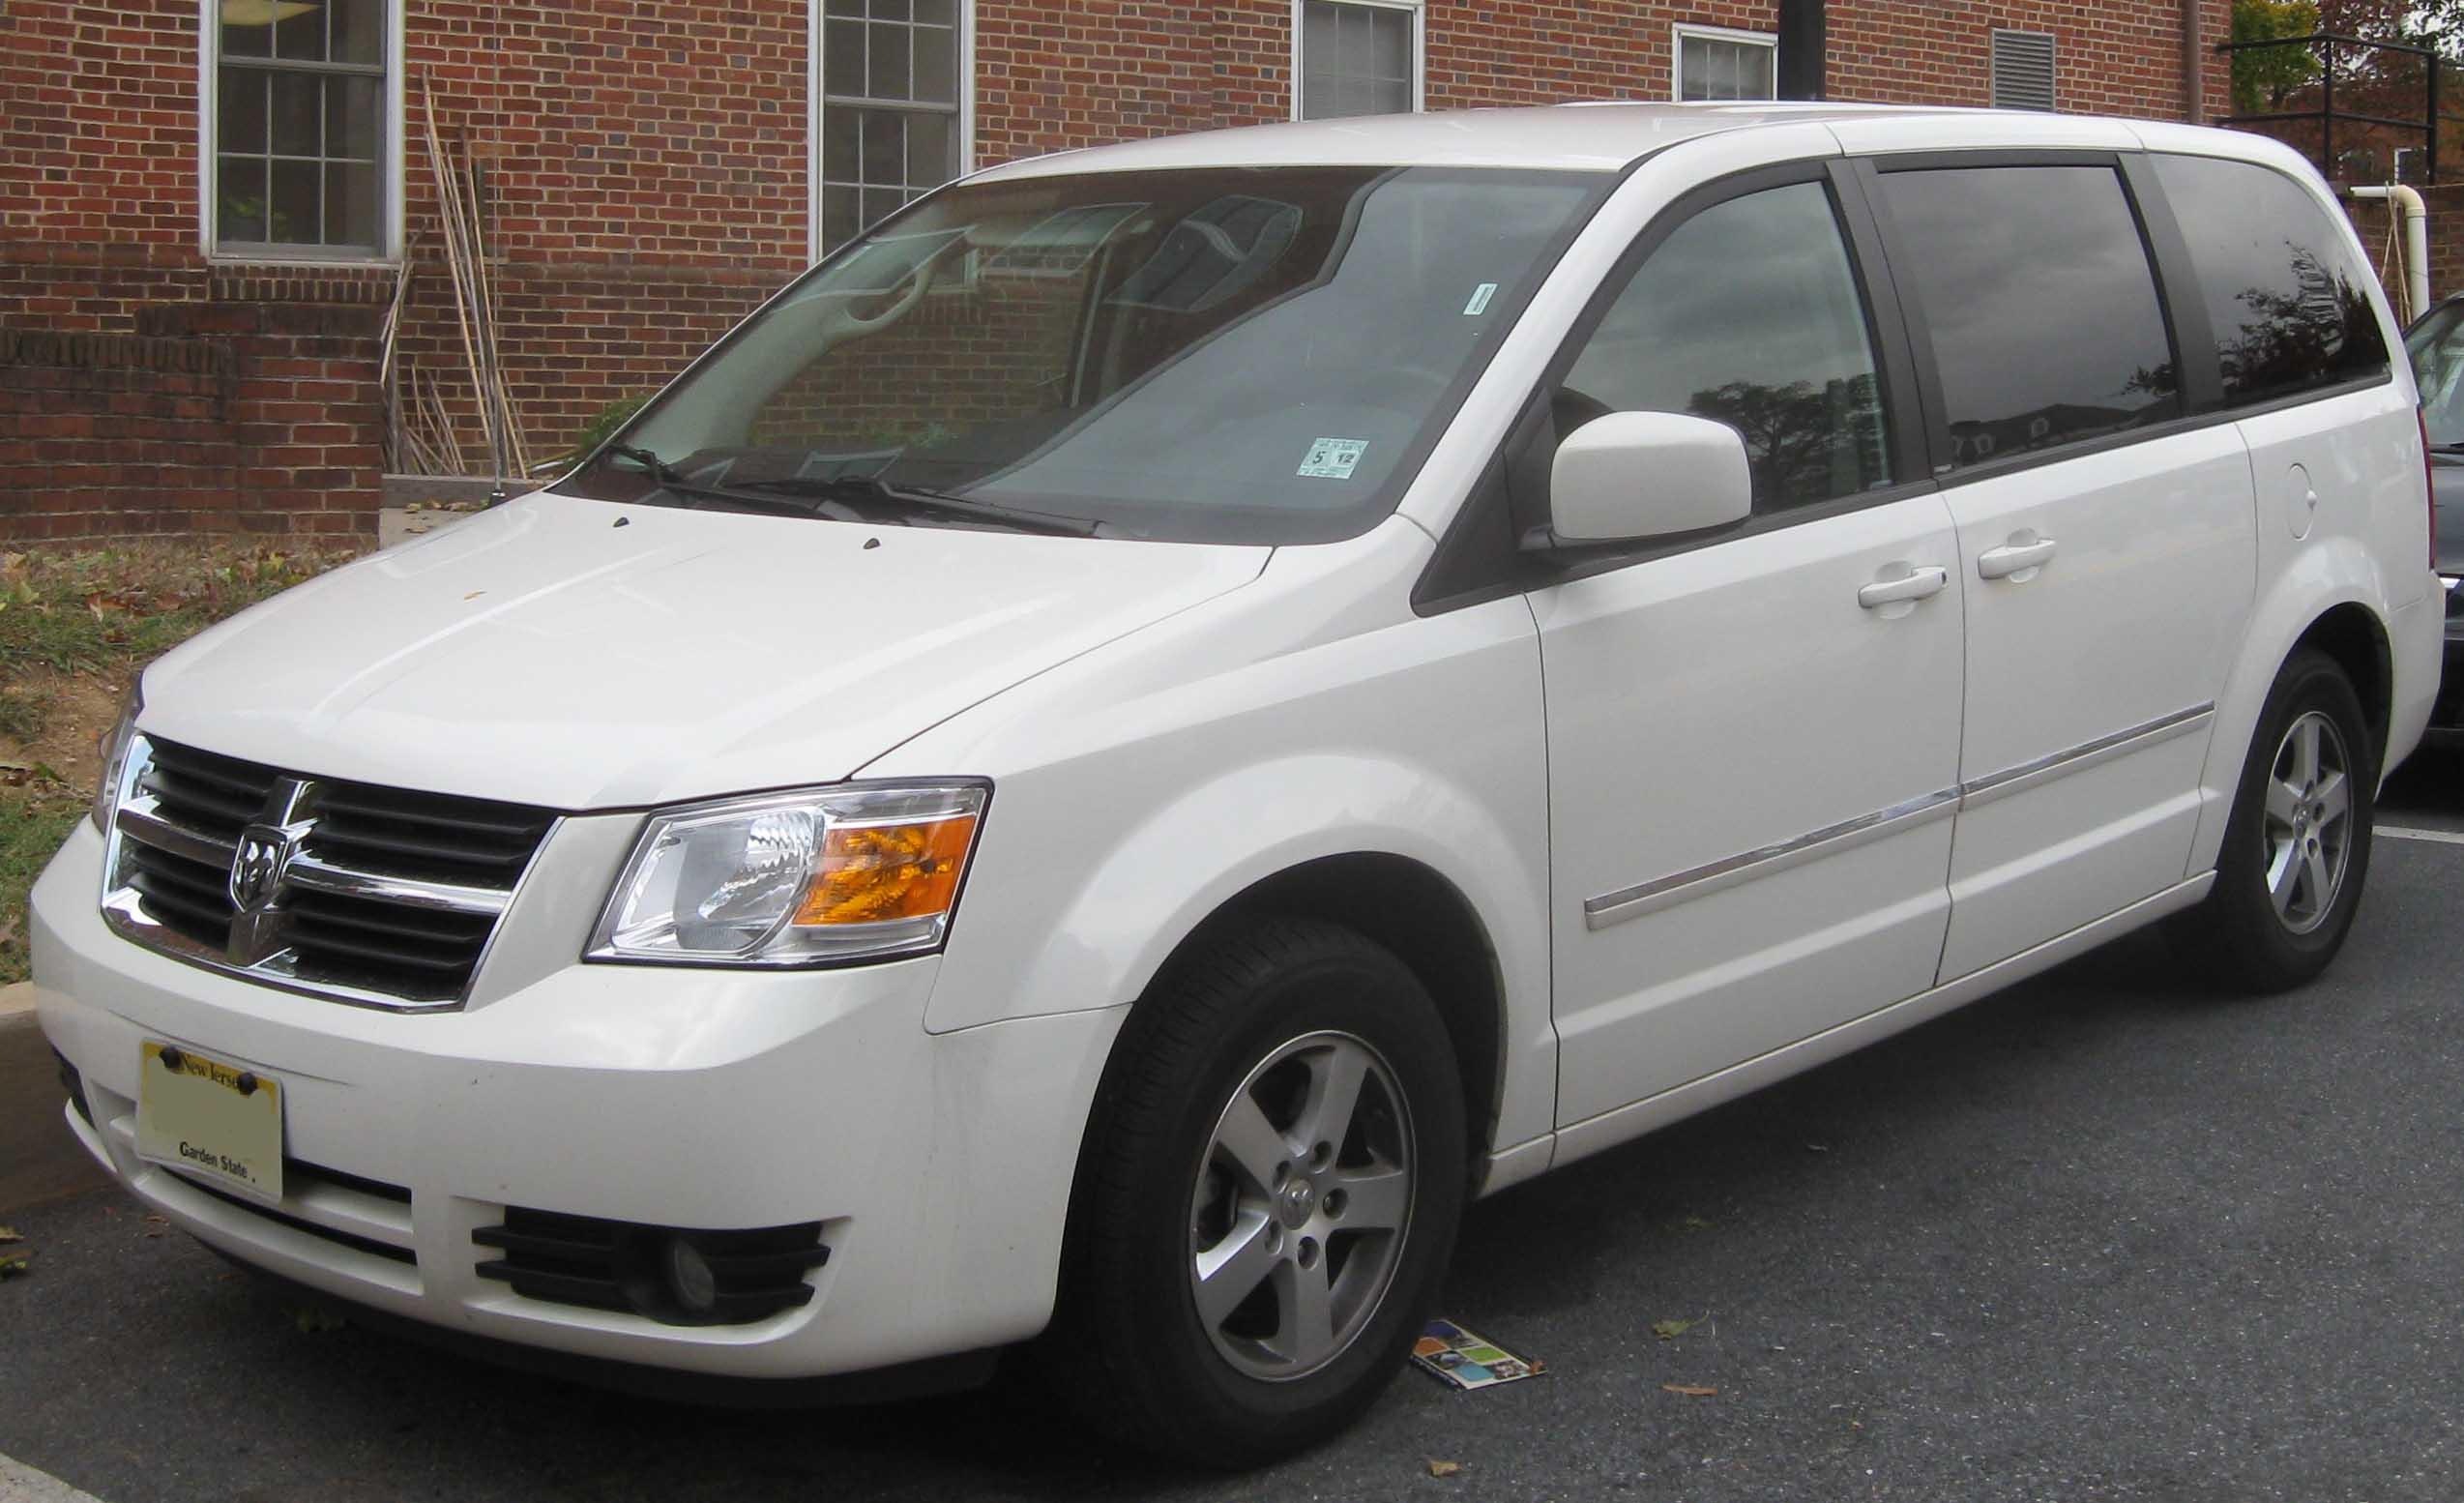 Dodge Caravan – Wikipedia